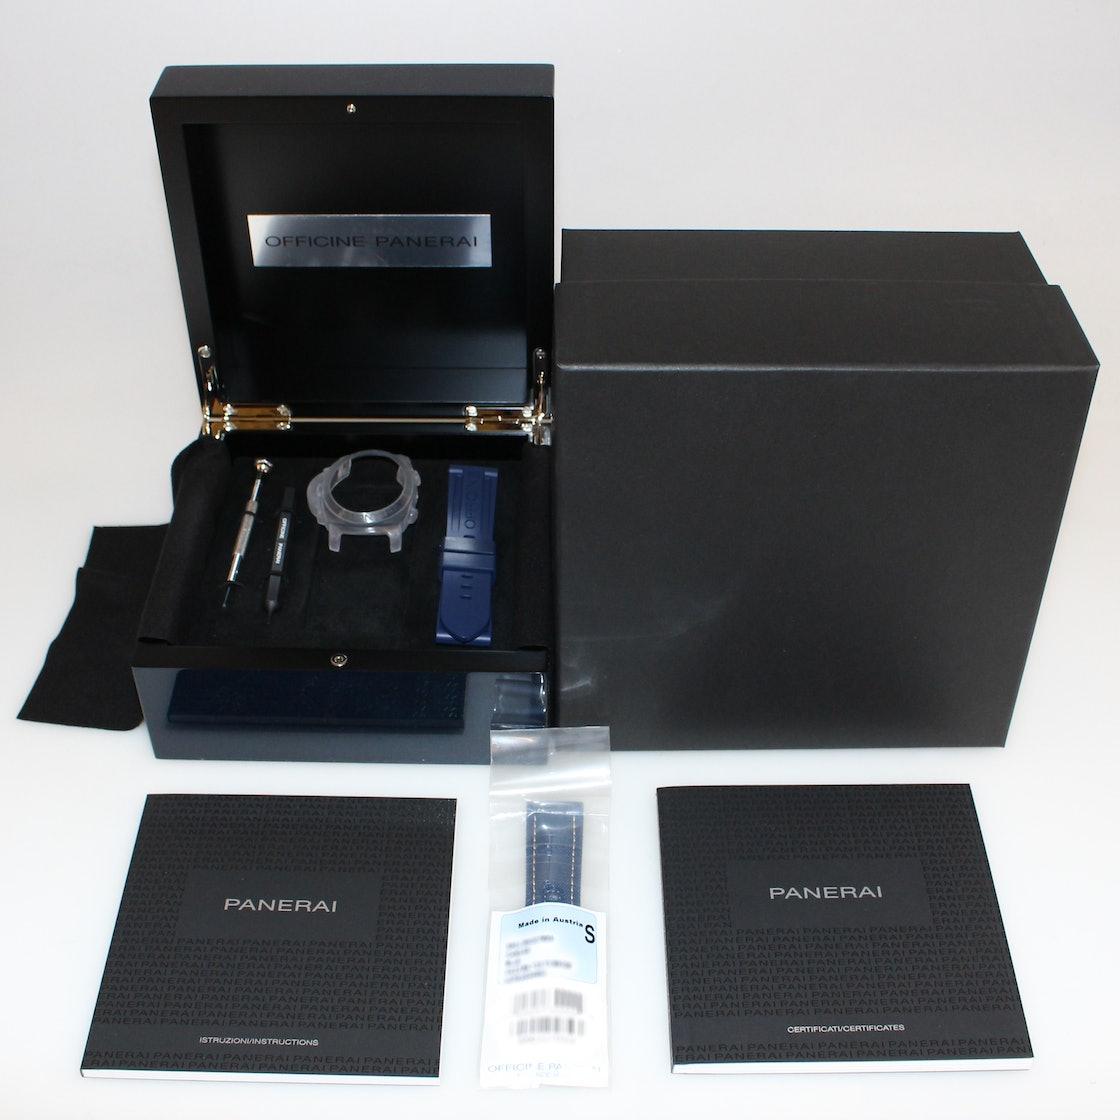 "Panerai Luminor 1950 10-Days GMT ""Design Miami"" Limited Edition PAM 986"